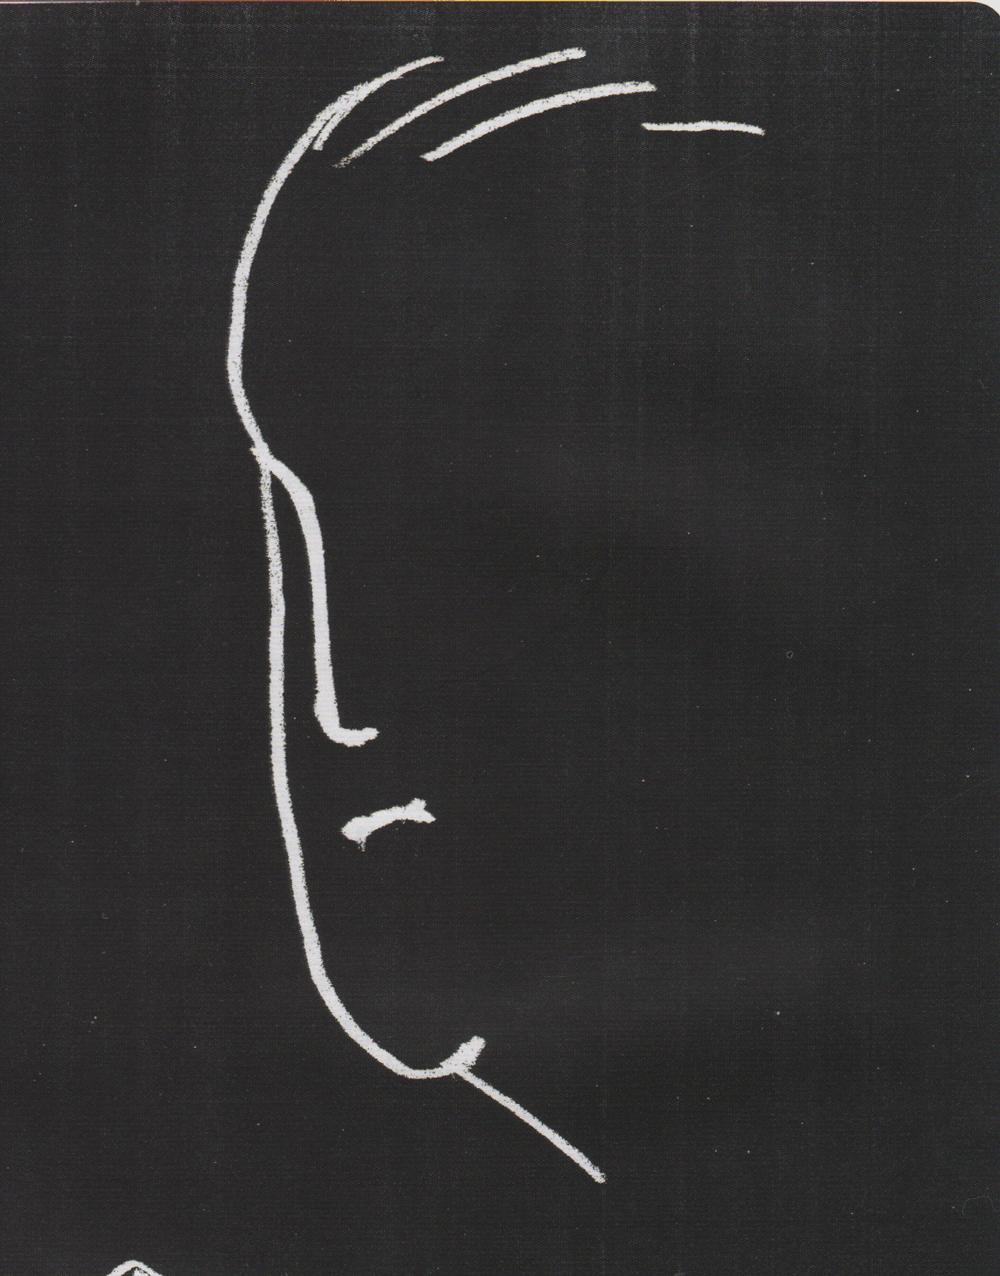 hans-norman-dahl-proysentegning